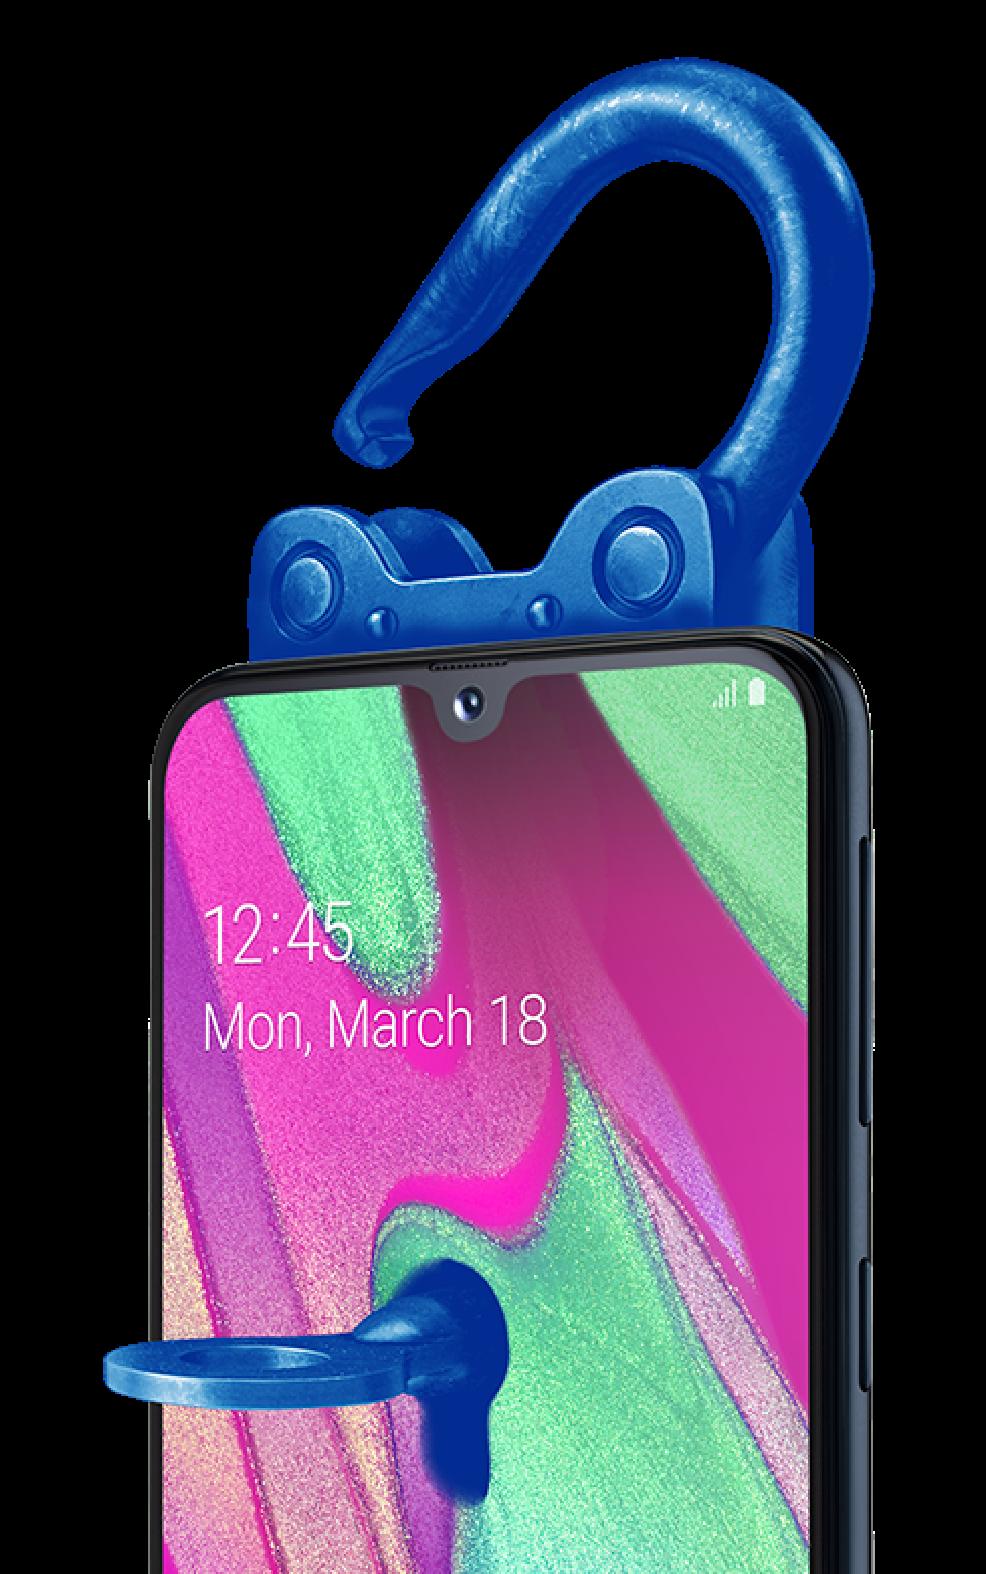 Phone image lock